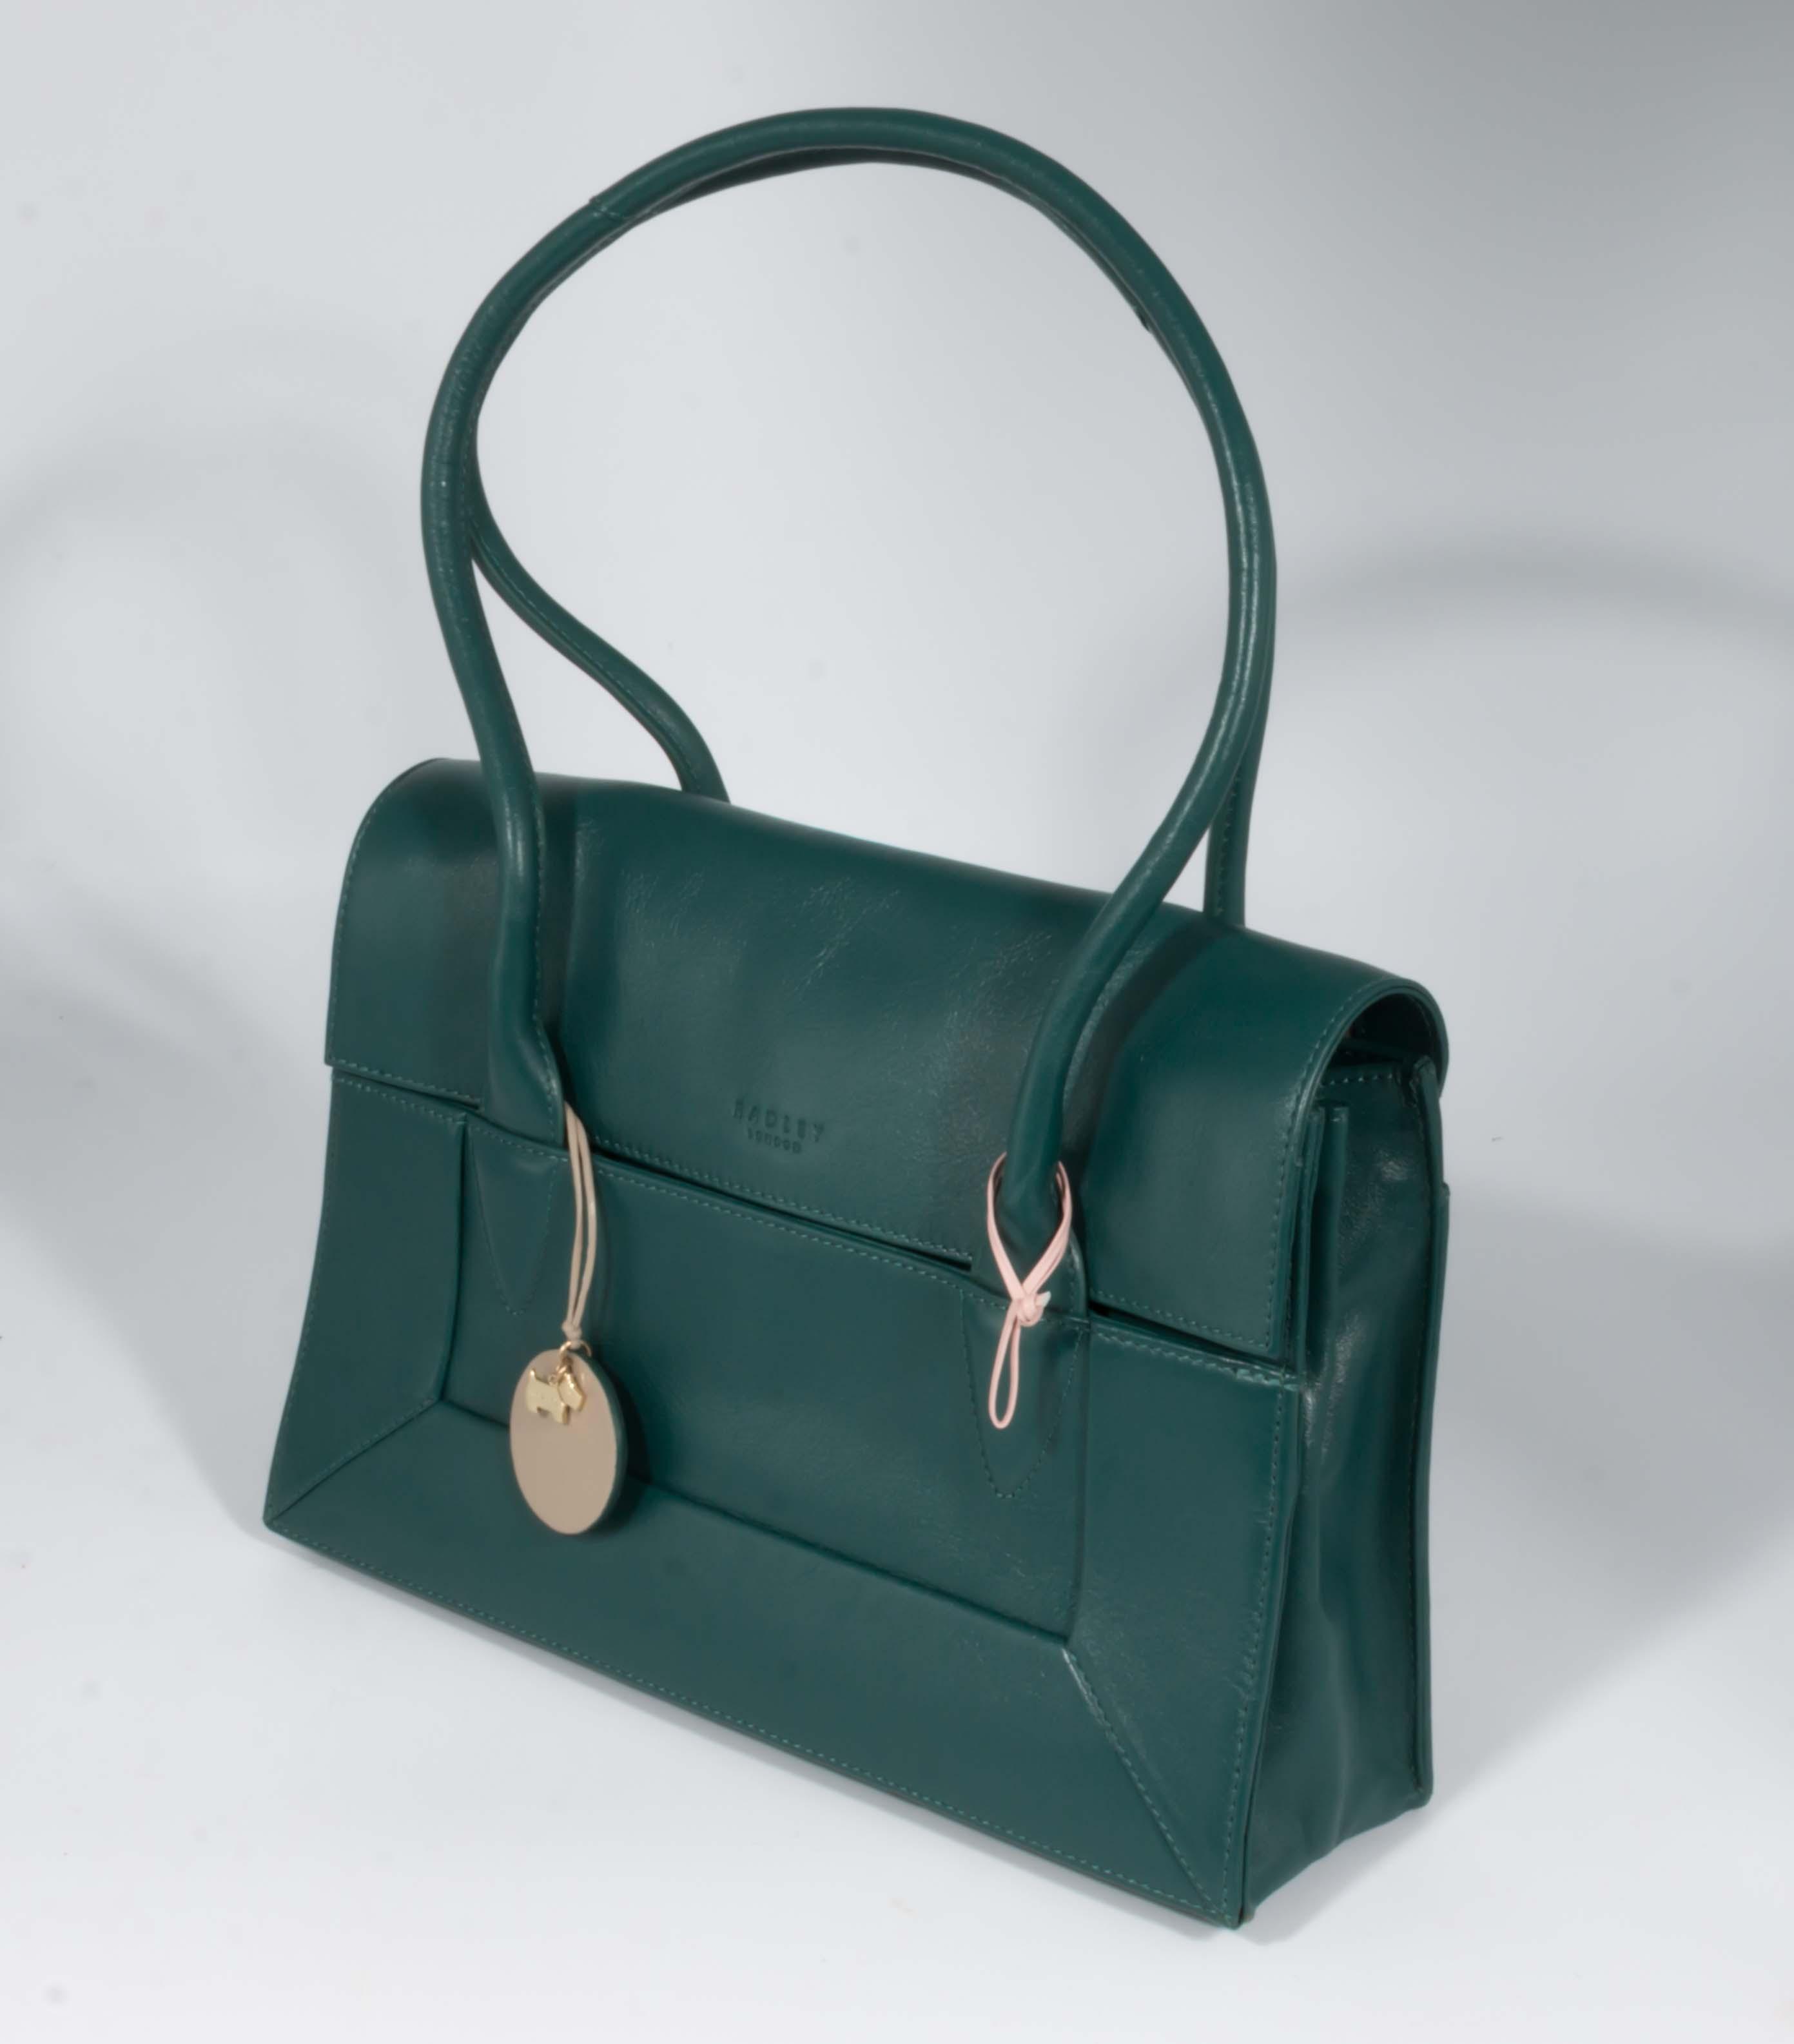 Lot 107 - A Radley handbag, with dust cover